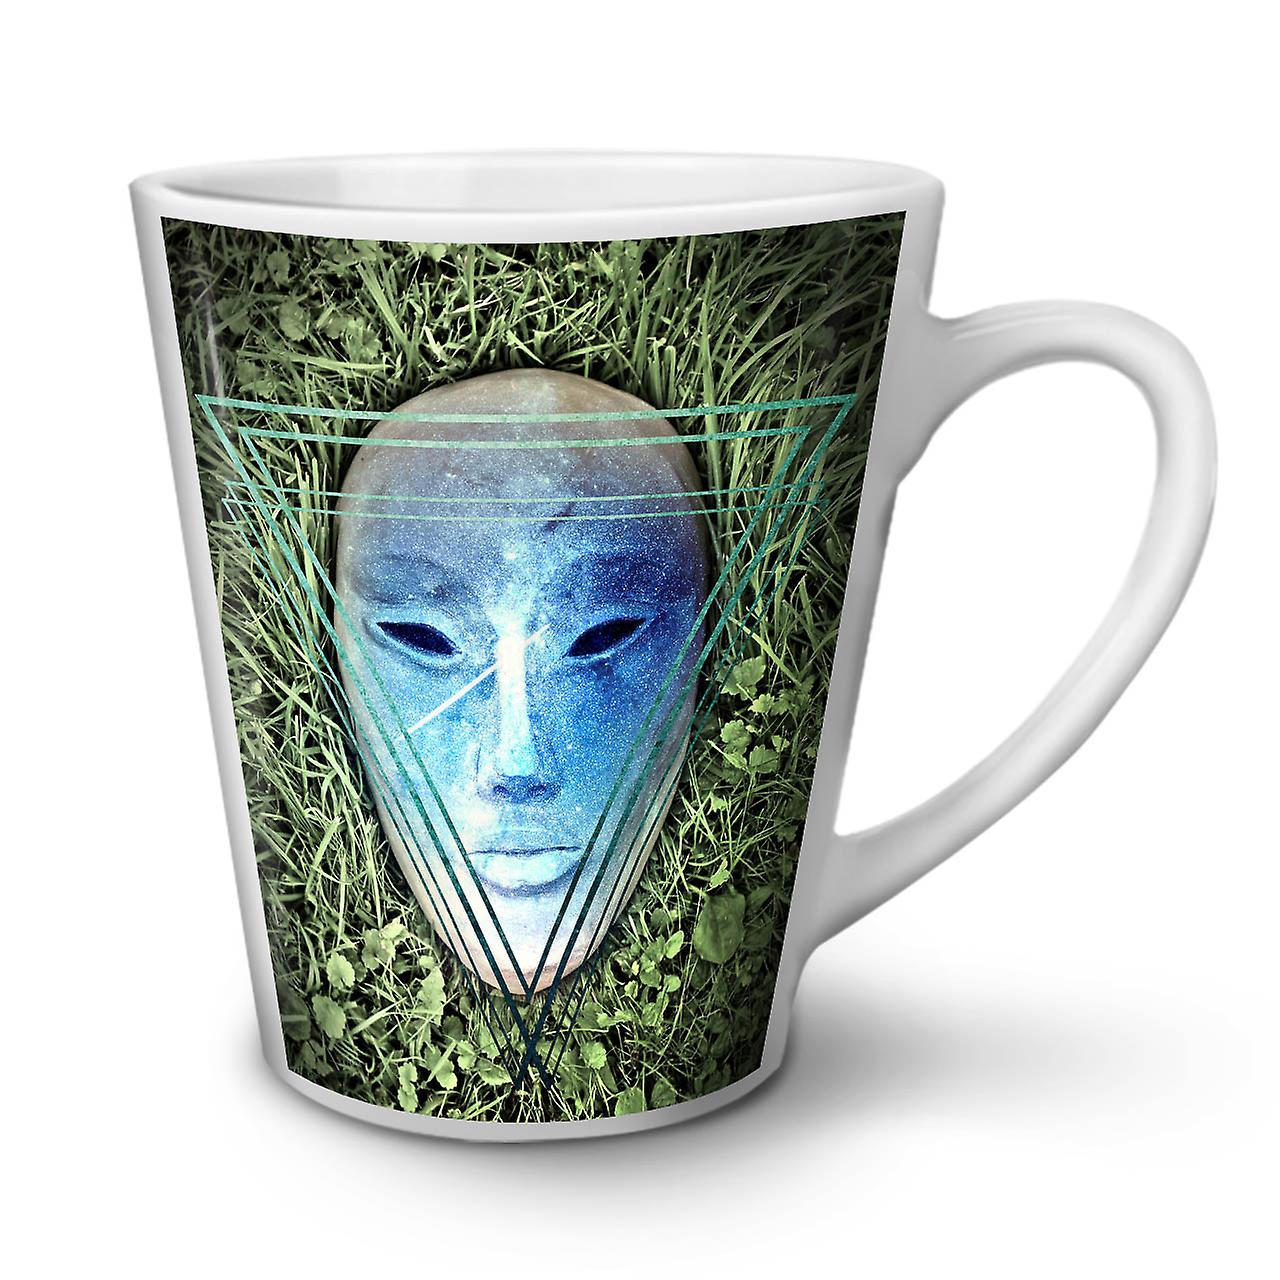 Mystic Tea Being Coffee 12 Ceramic New OzWellcoda Latte Mask Mug White jAL34R5